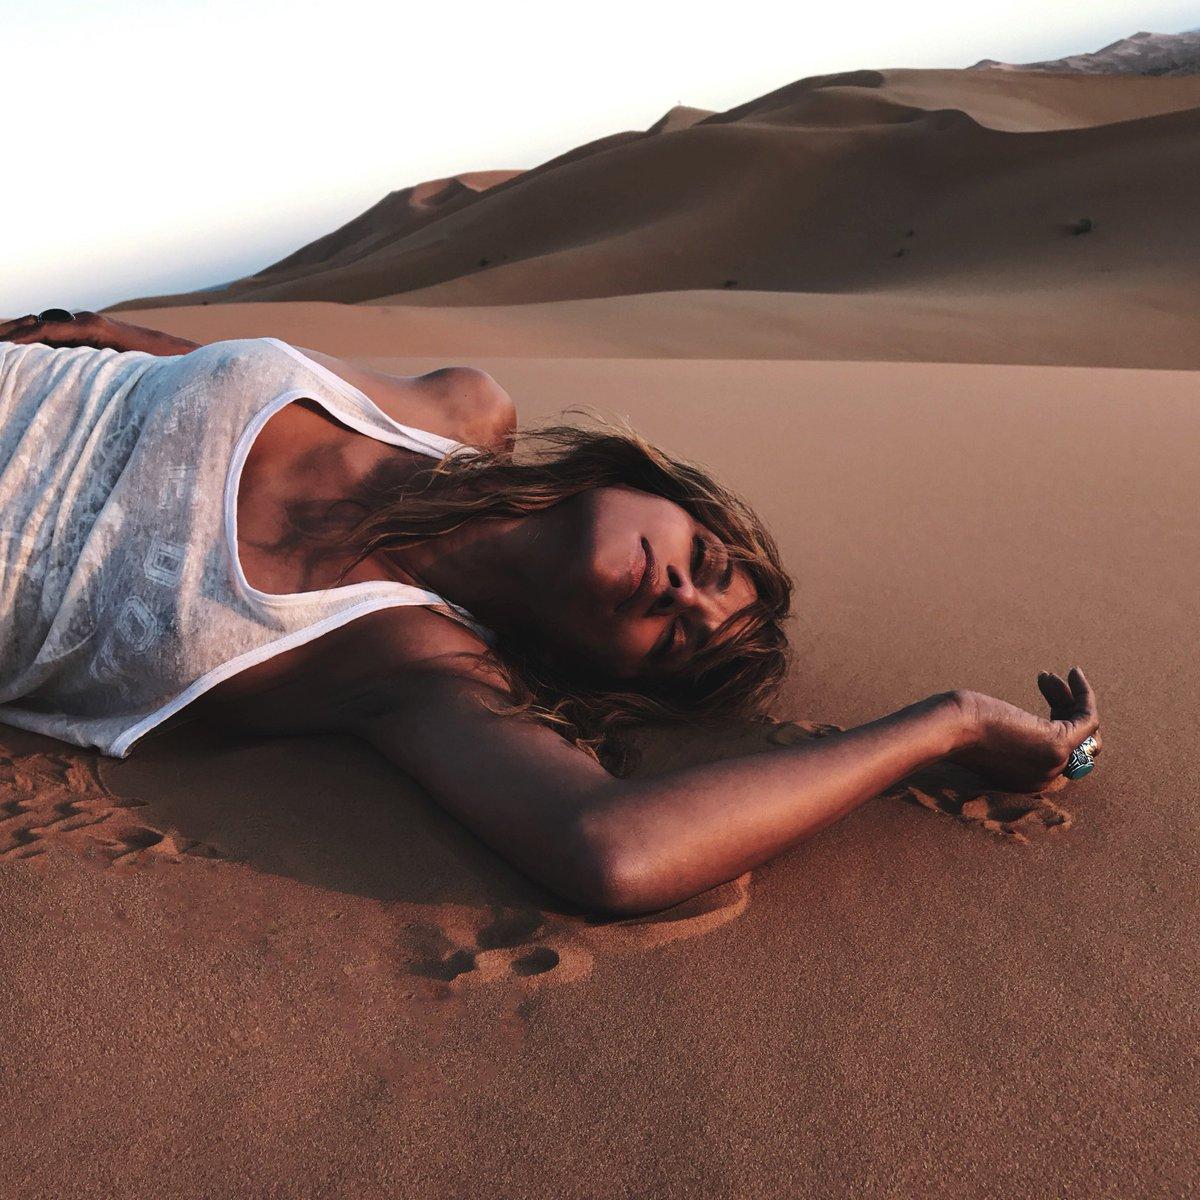 Sahara Sunning ☀️ https://t.co/un9OPJ9wQO